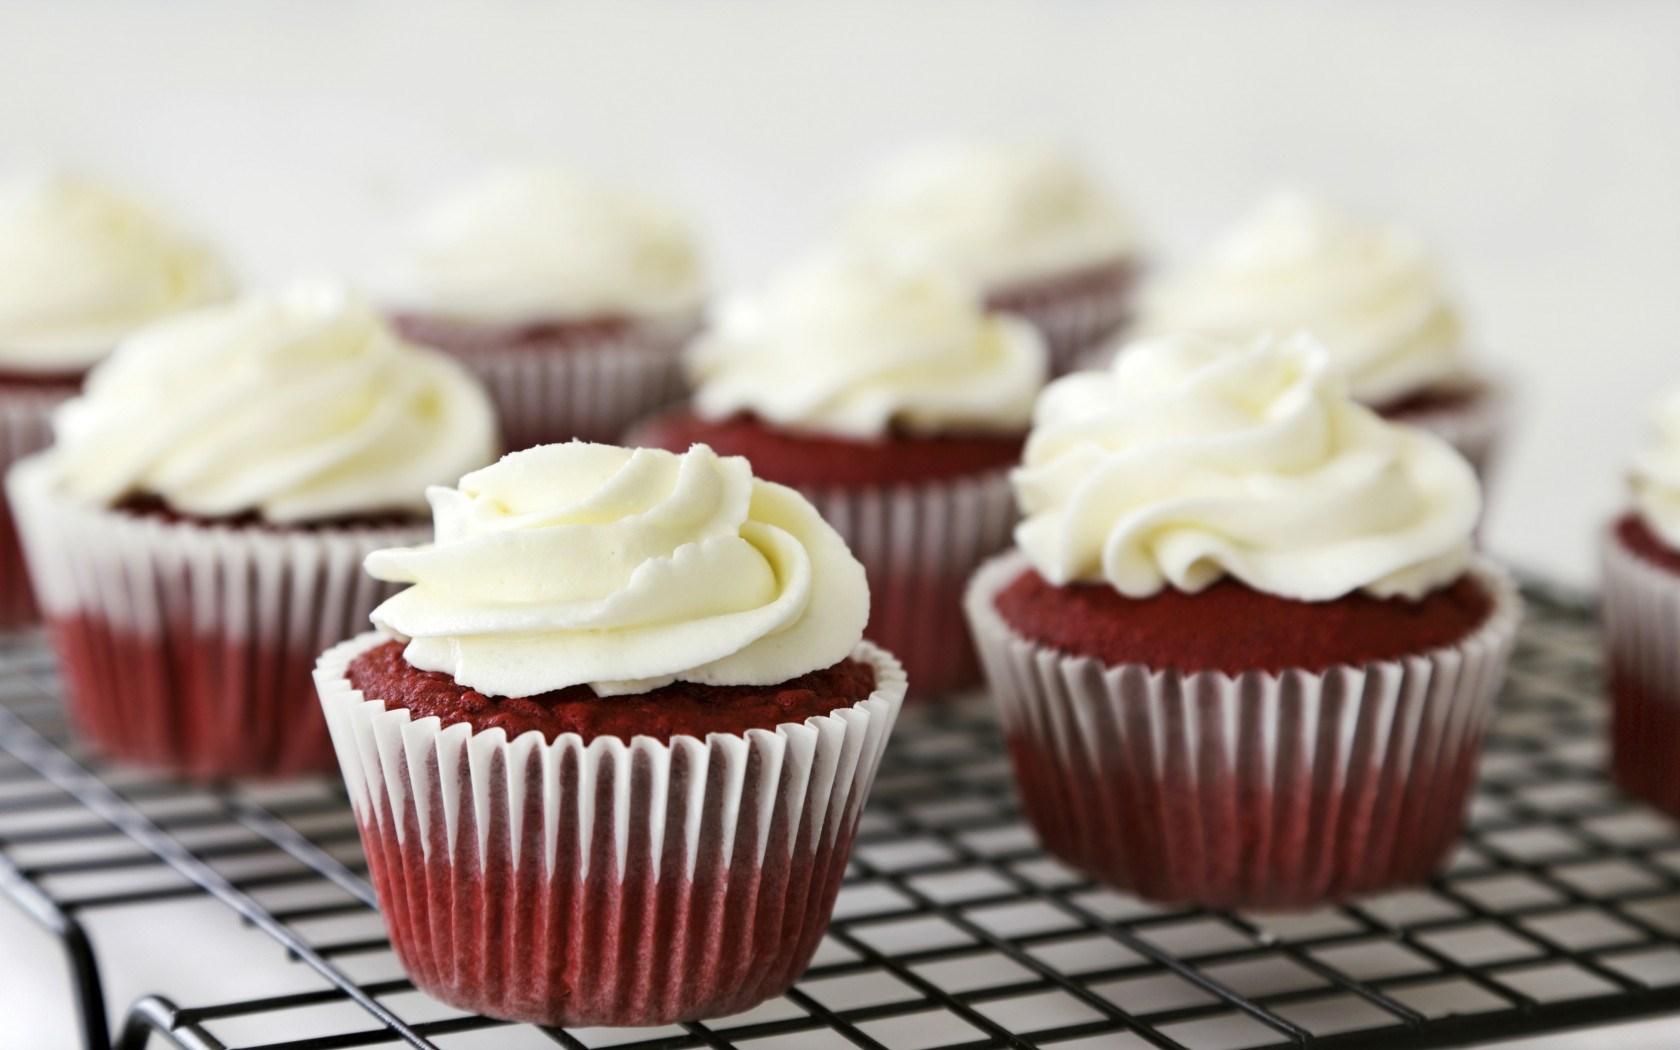 Muffins Cream Pastry Dessert